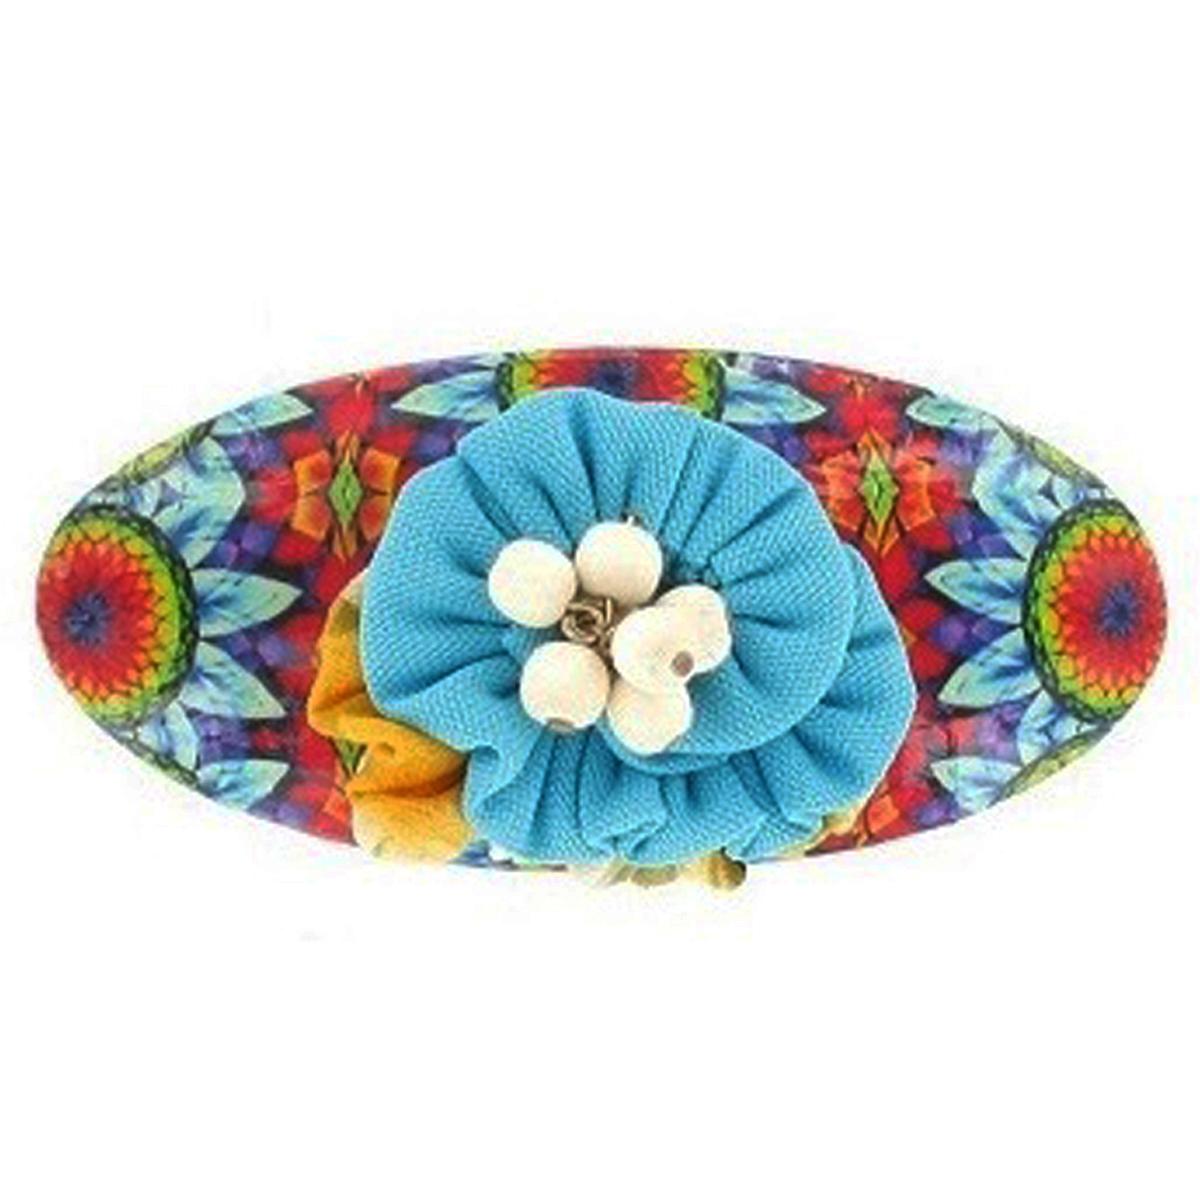 Barrette artisanale \'Mistinguette\' turquoise multicolore - 90x40 mm - [R4329]